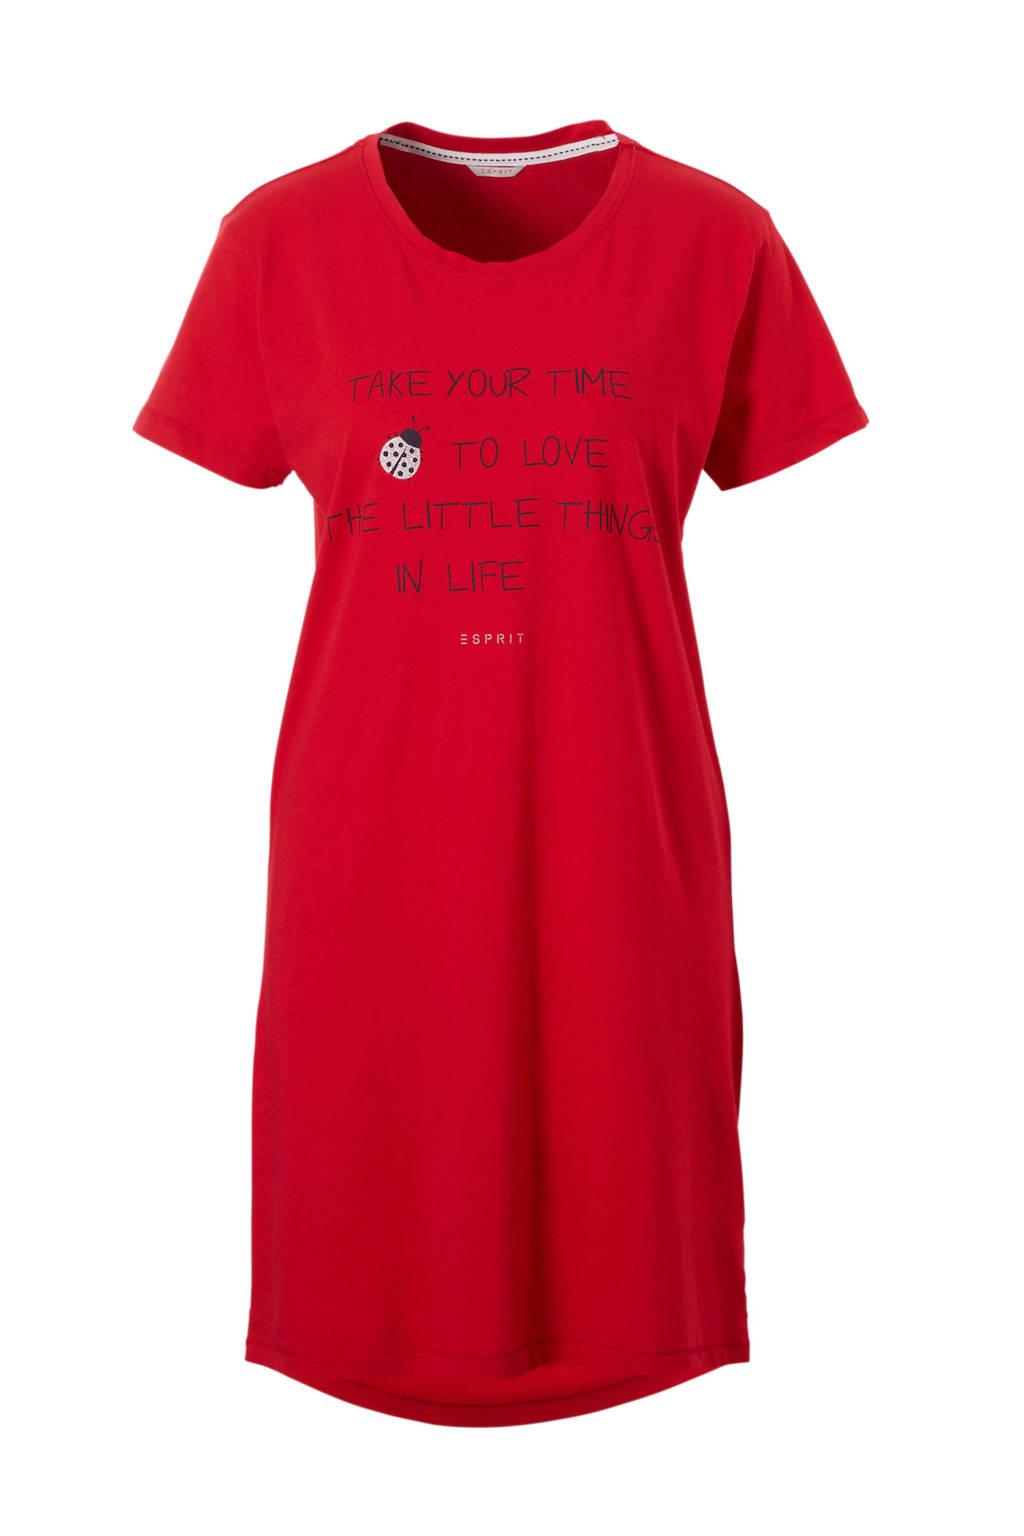 ESPRIT Women Bodywear nachthemd met tekstopdruk rood, Rood/marine